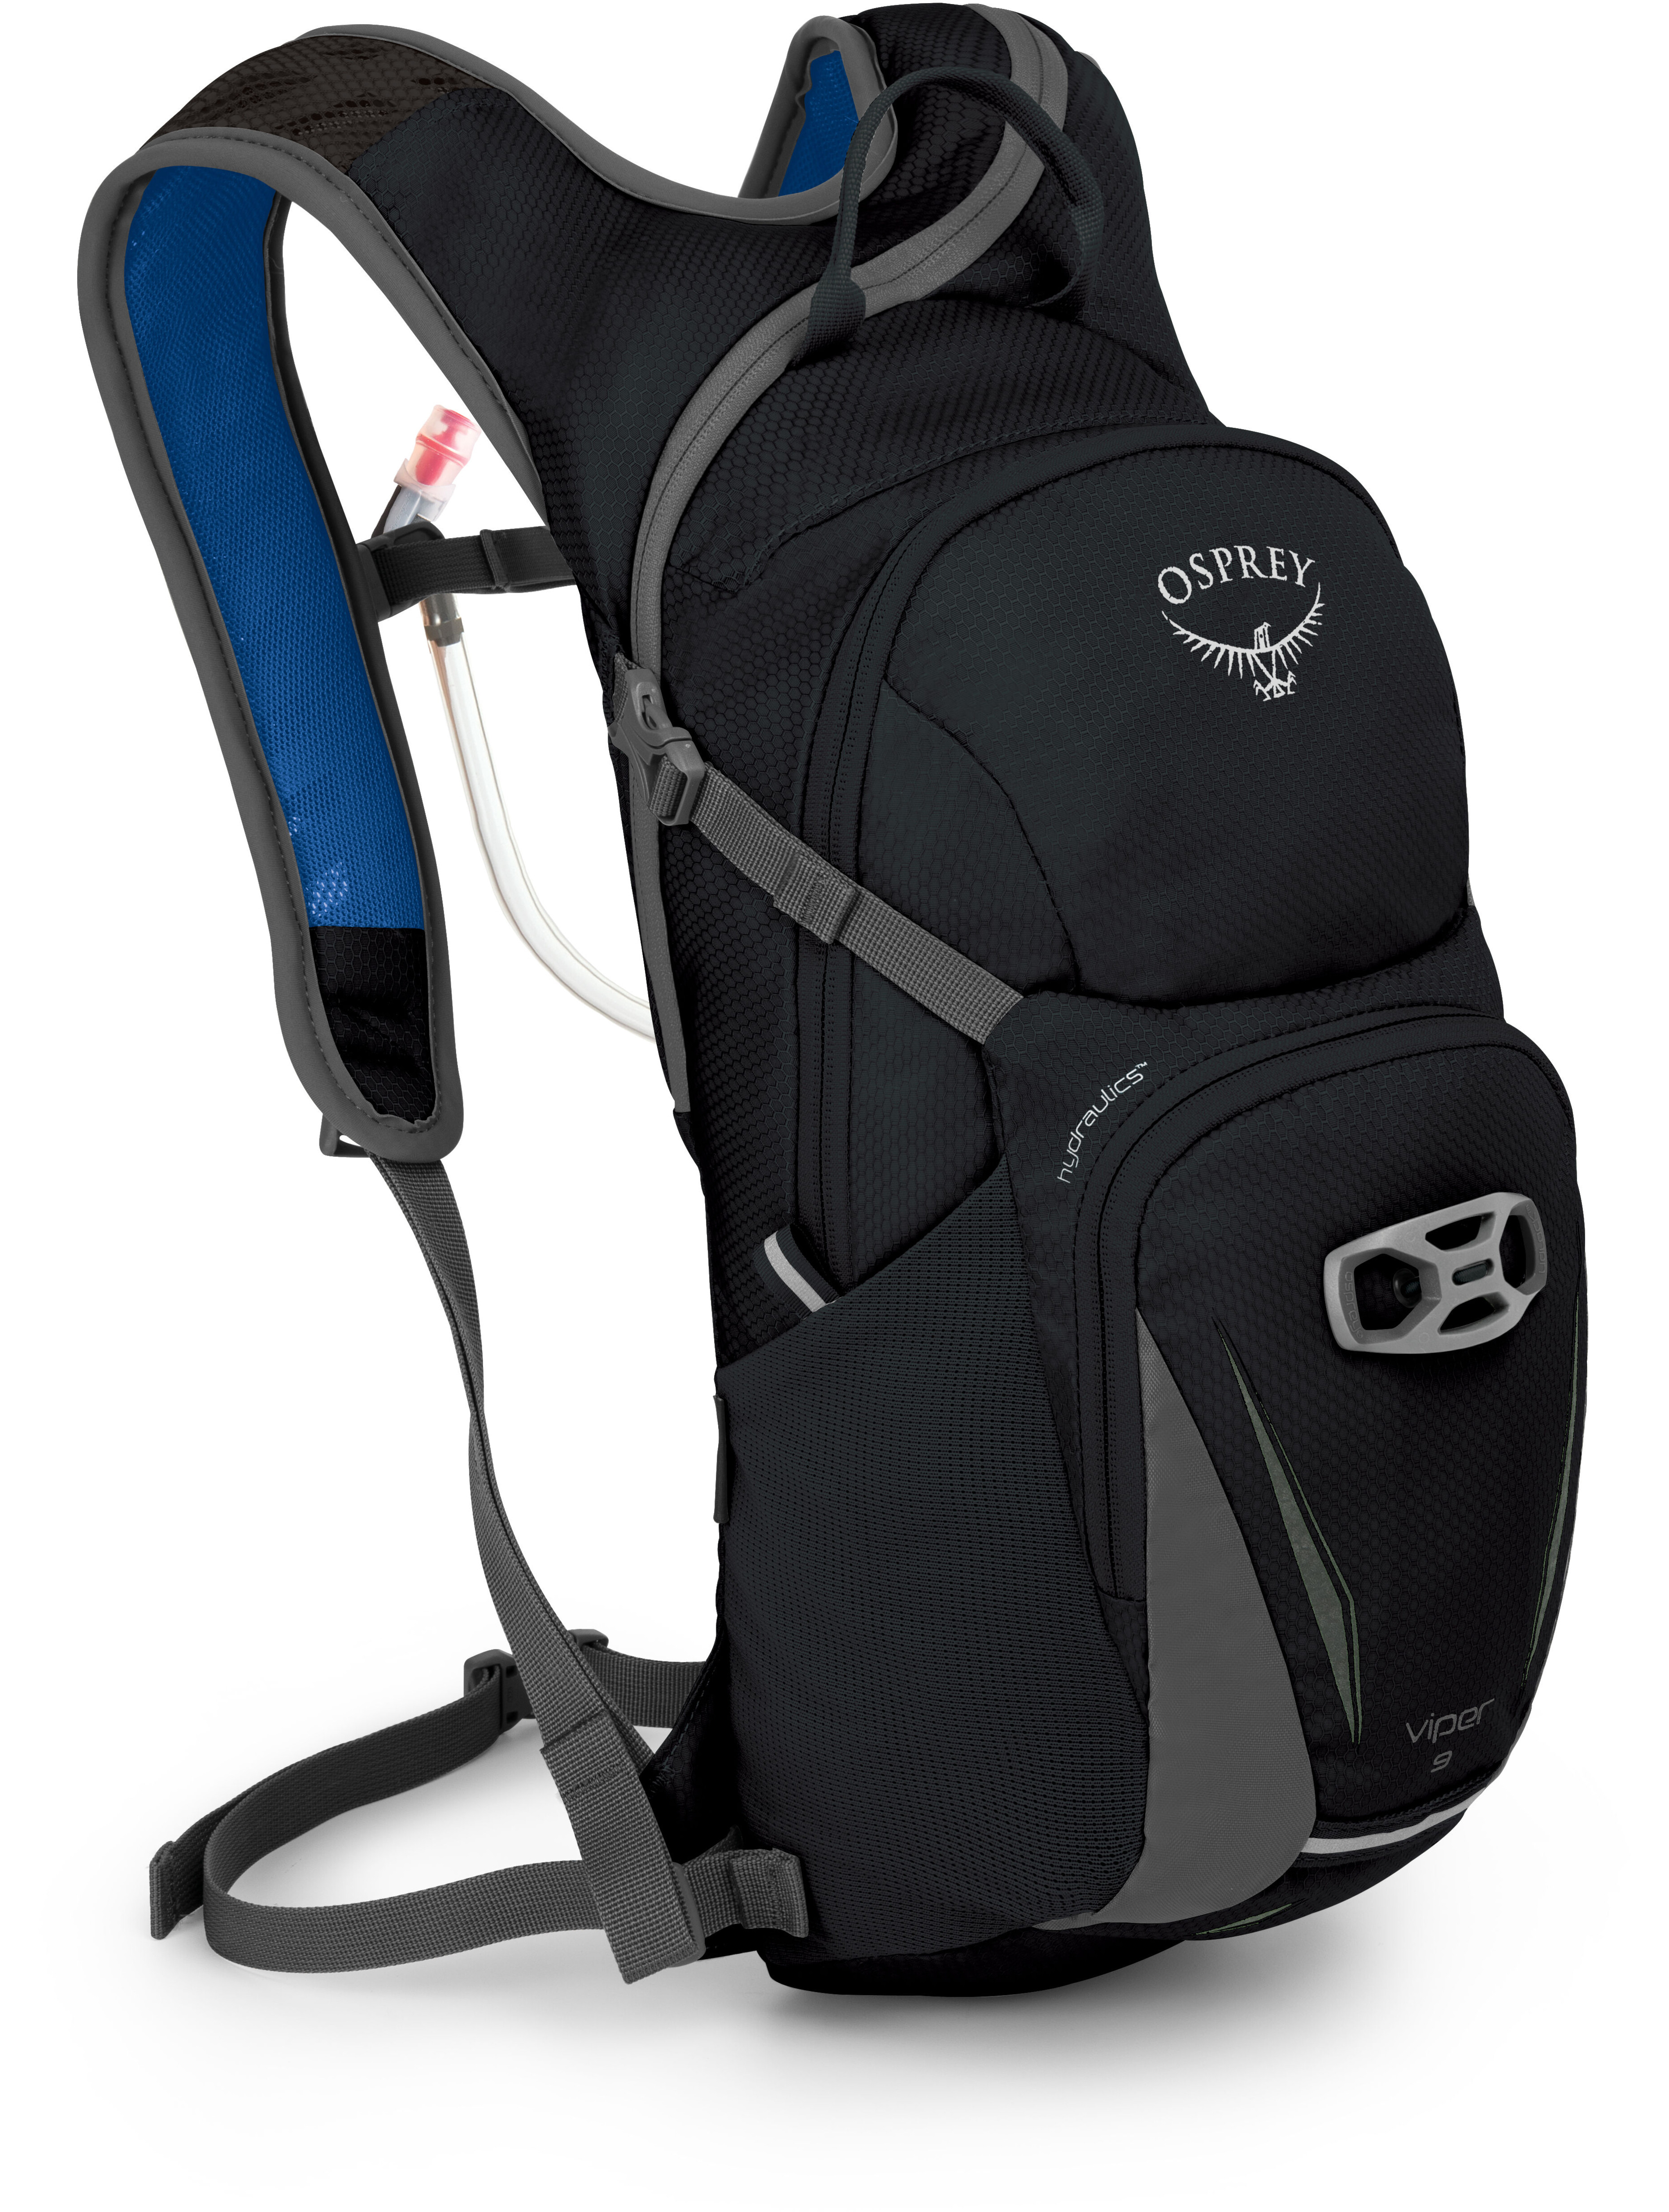 Osprey Viper 9 Ryggsäck Herr svart - till fenomenalt pris på Bikester 69c865afaeb43